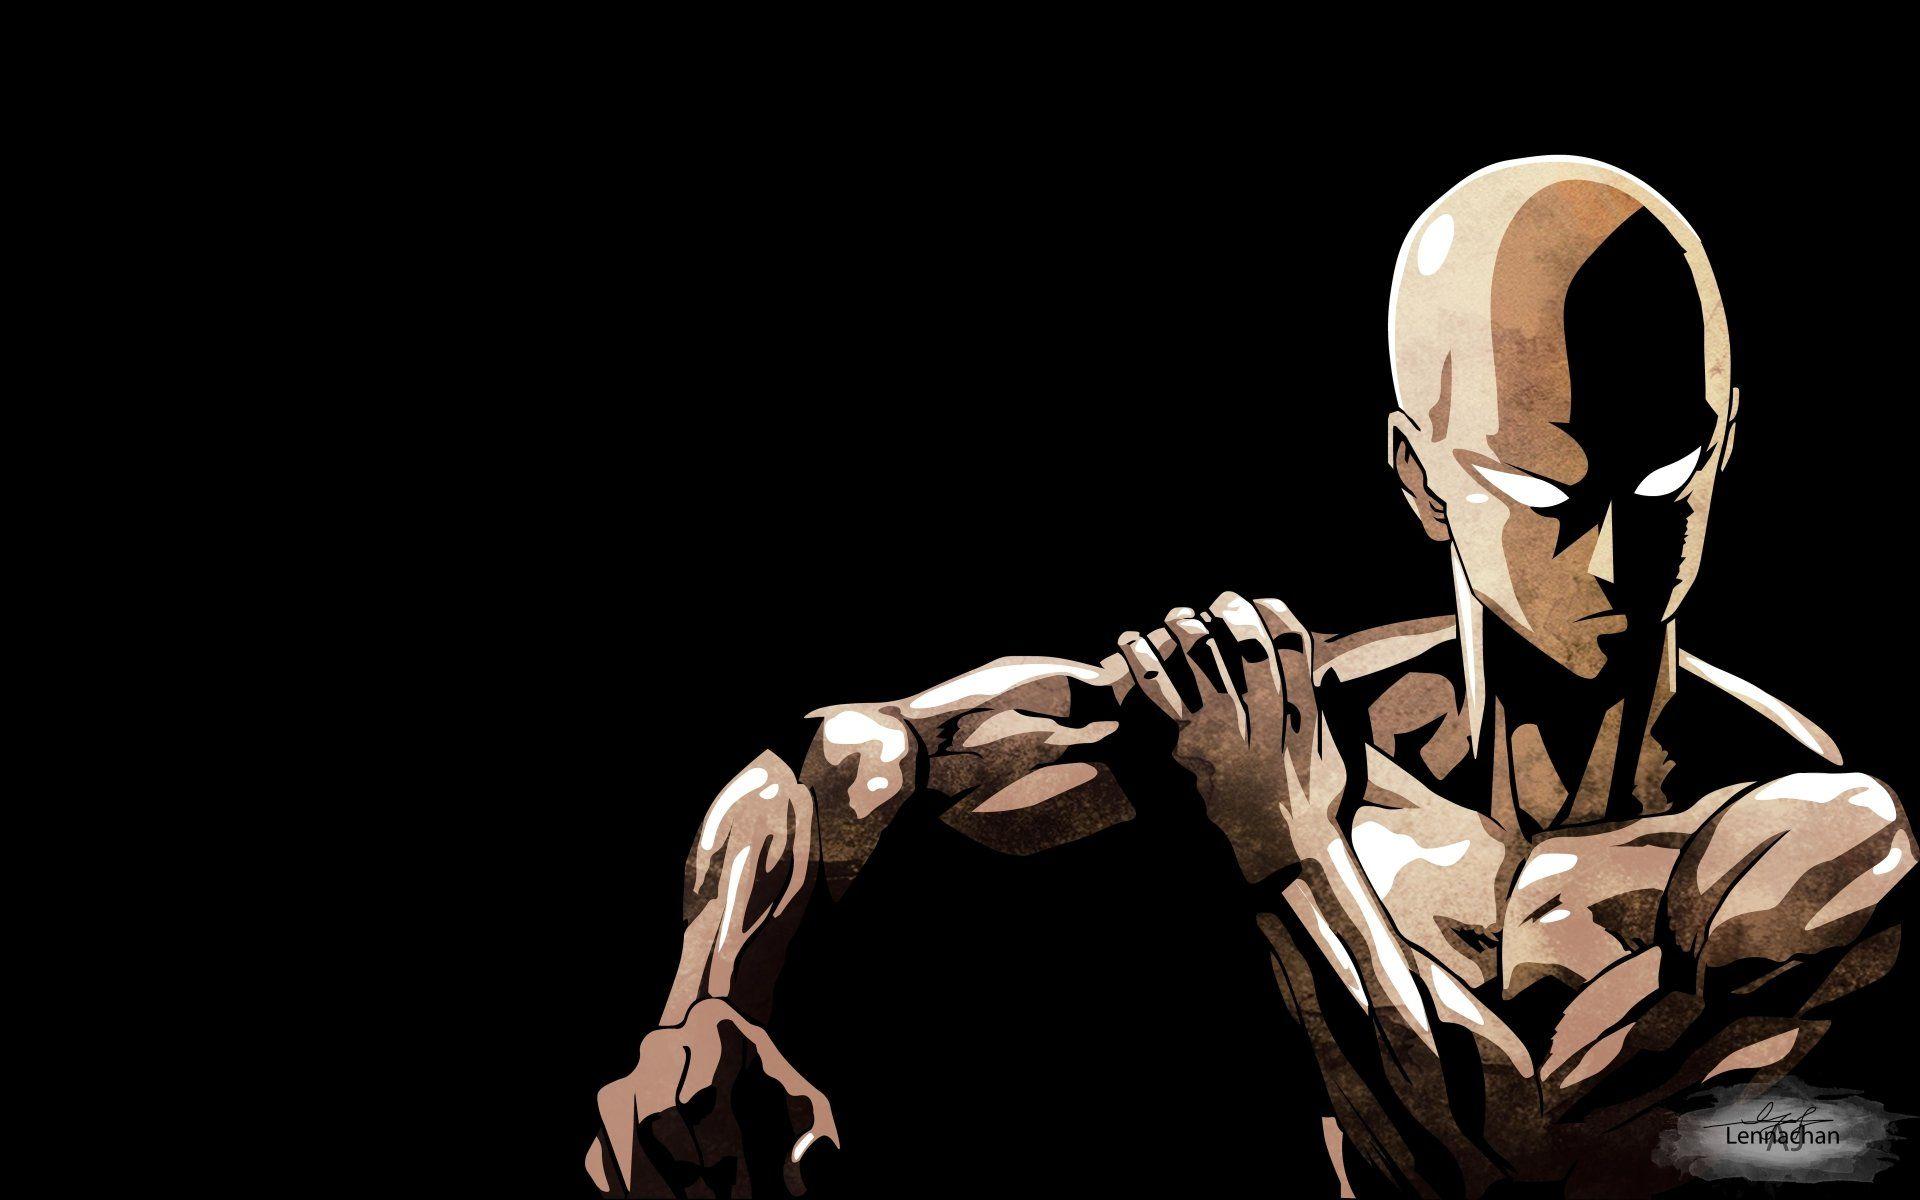 Anime One-Punch Man Saitama (One-Punch Man) Wallpaper ...